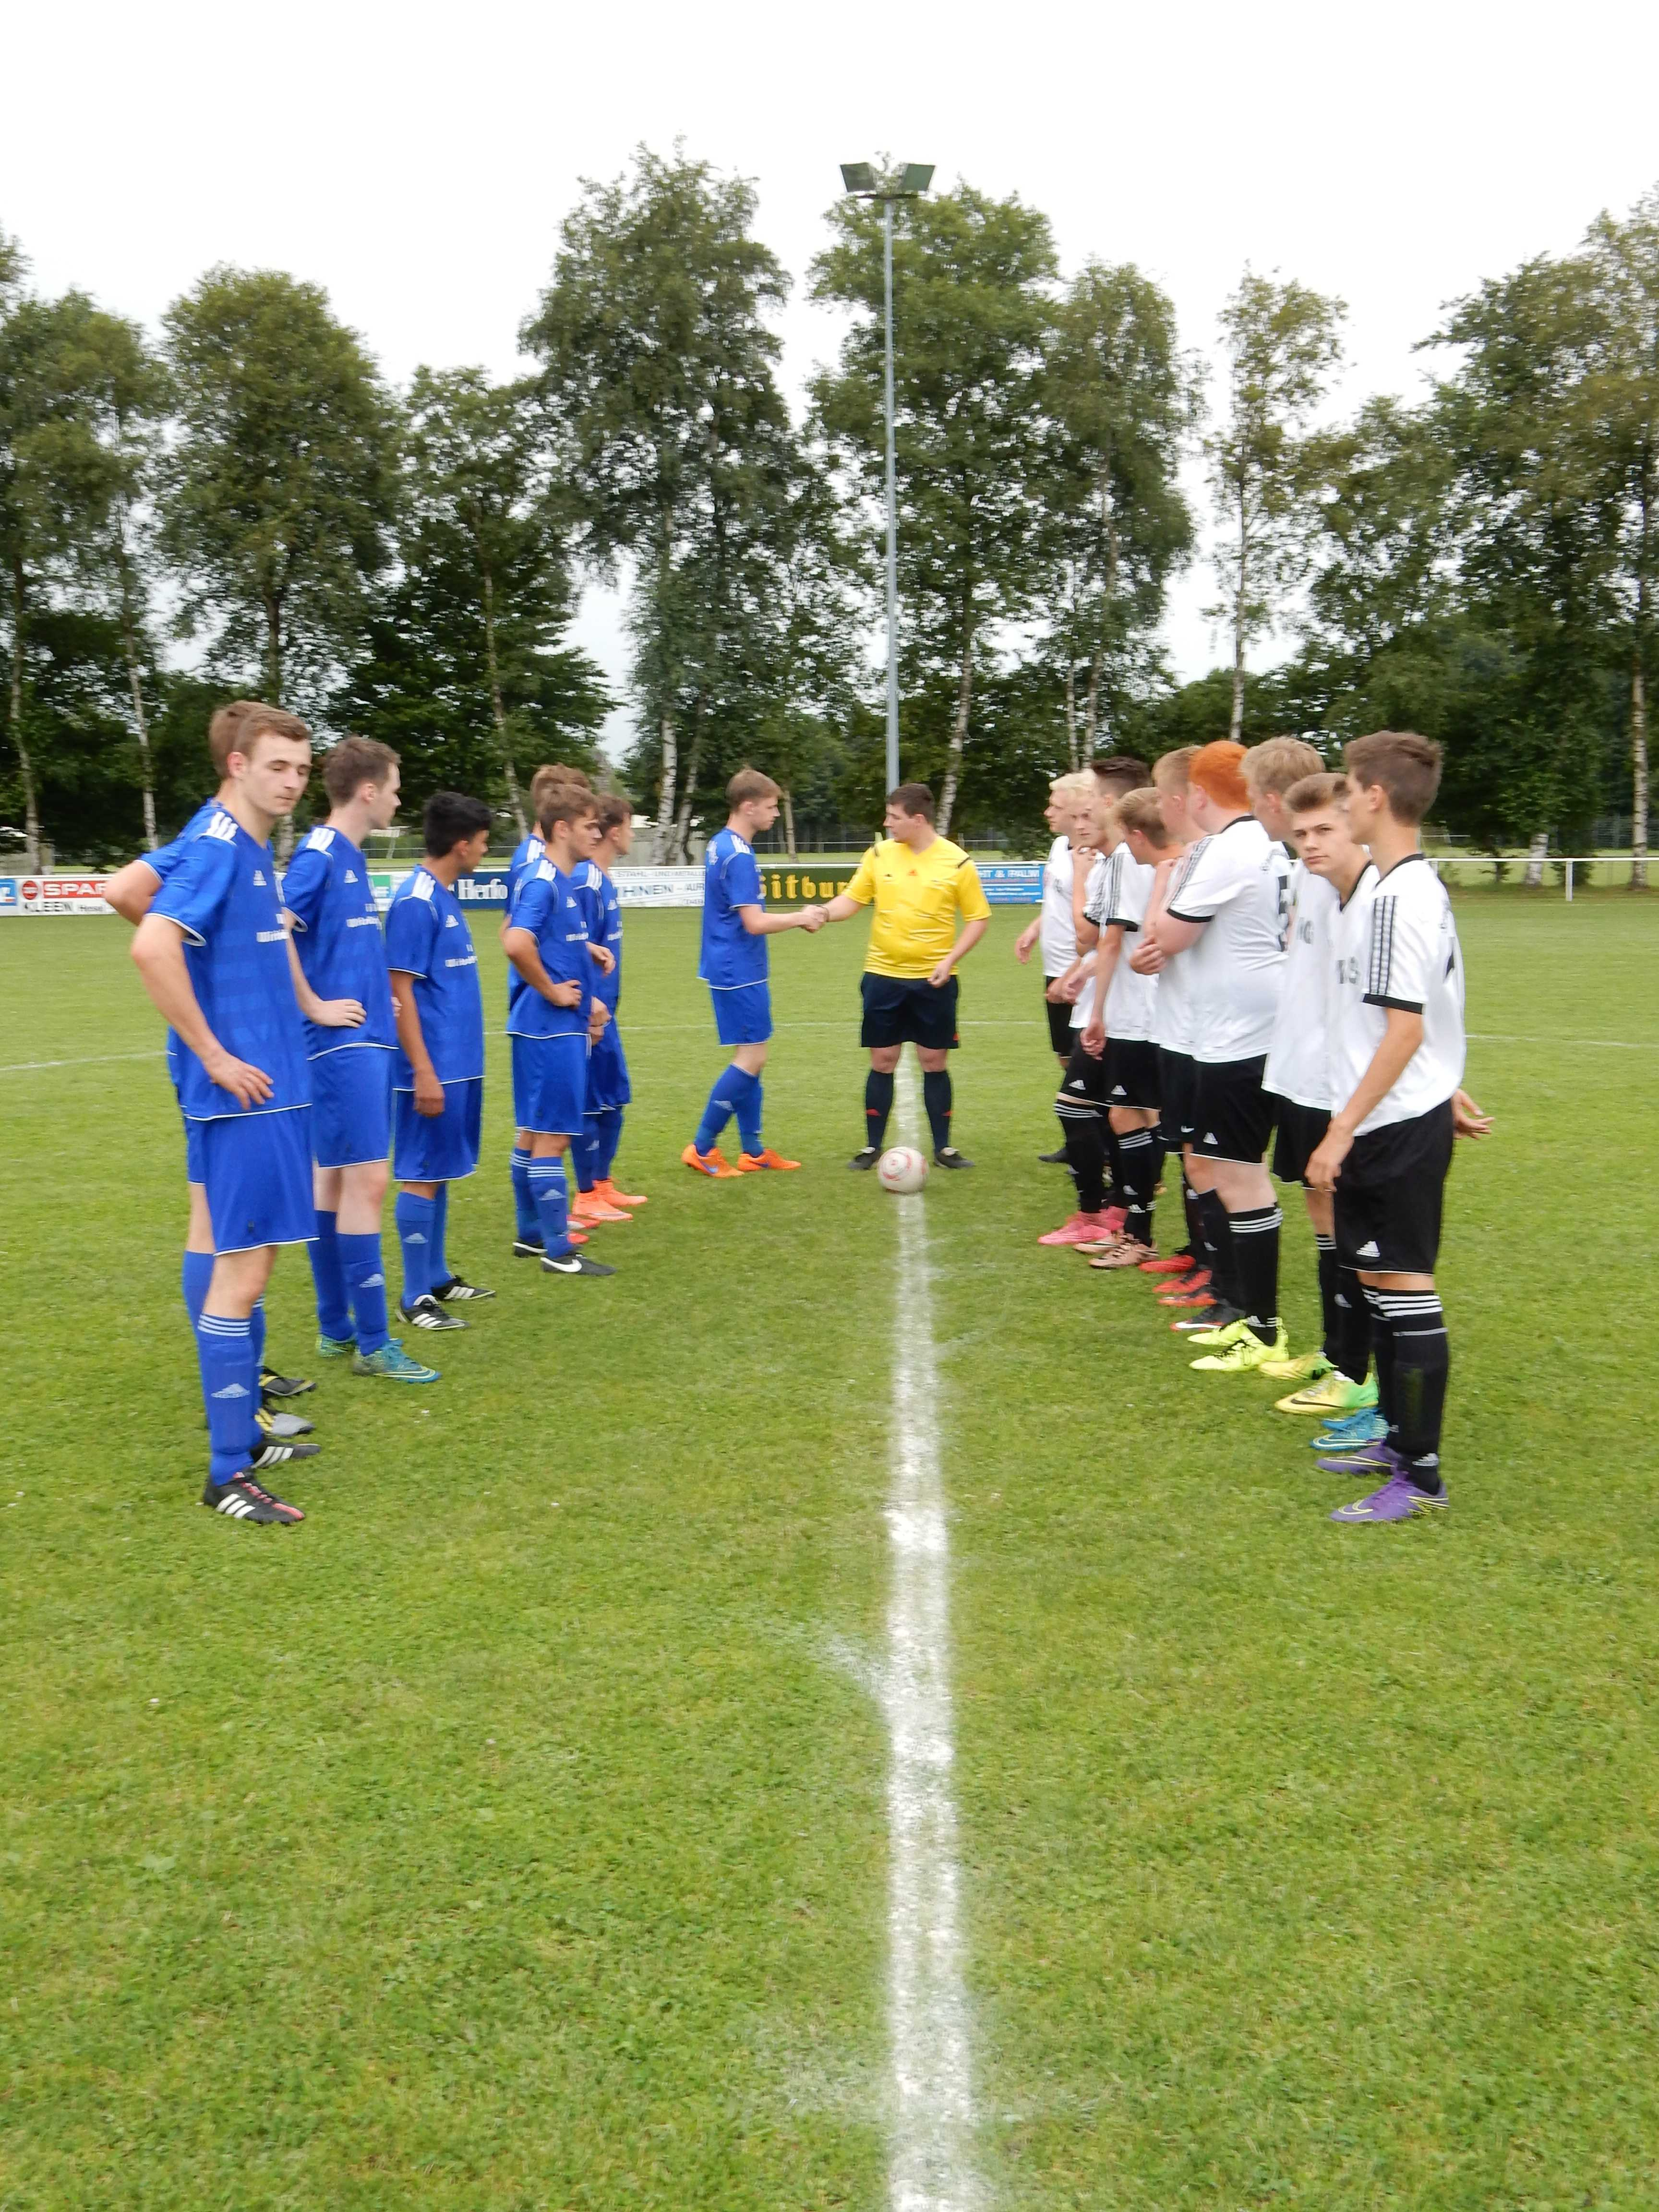 2016-07-28 Sportwoche - erster Donnerstag (23)